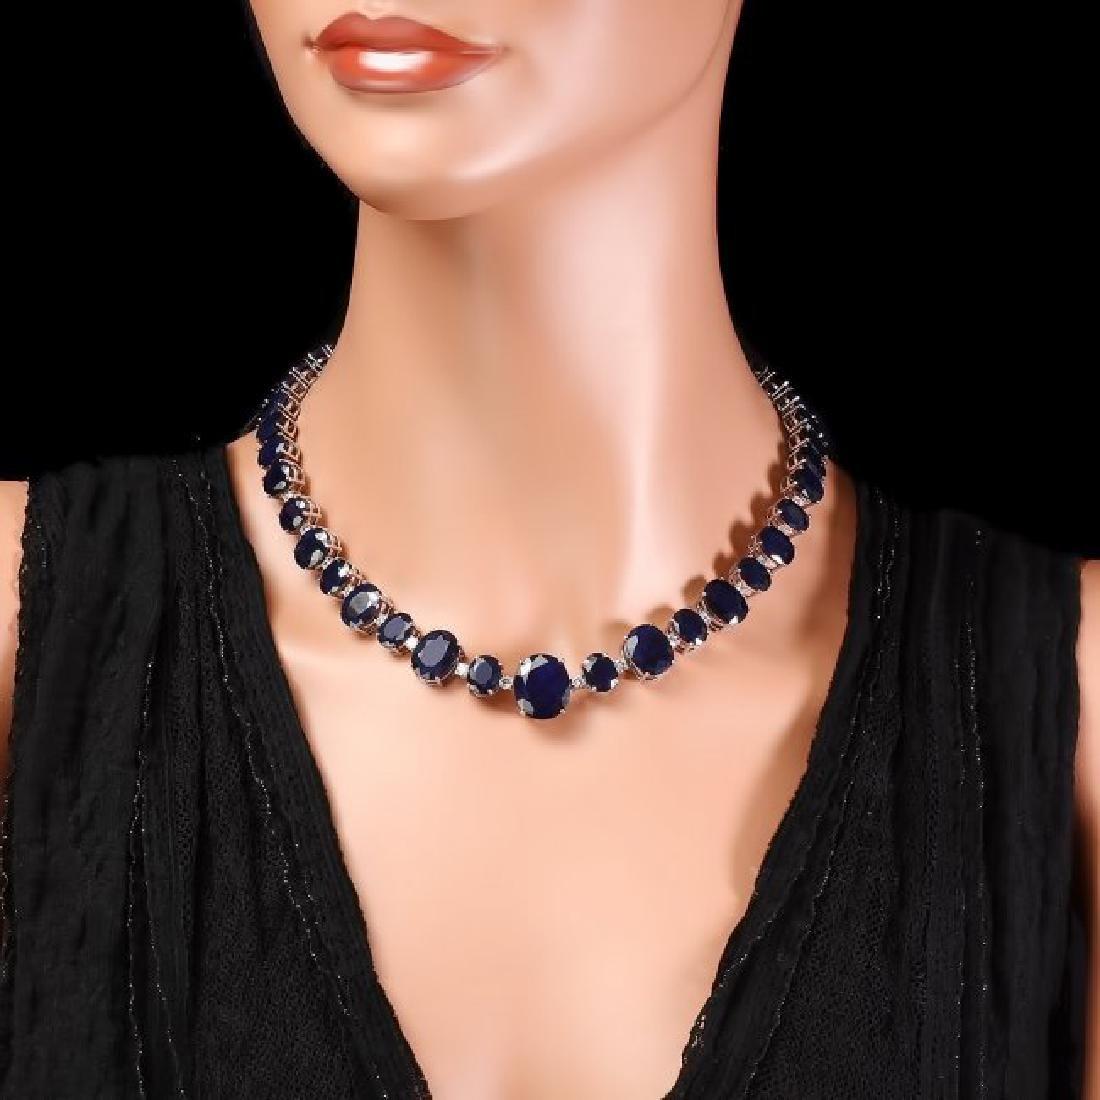 14k W Gold 164ct Sapphire 1.85ct Diamond Necklace - 7